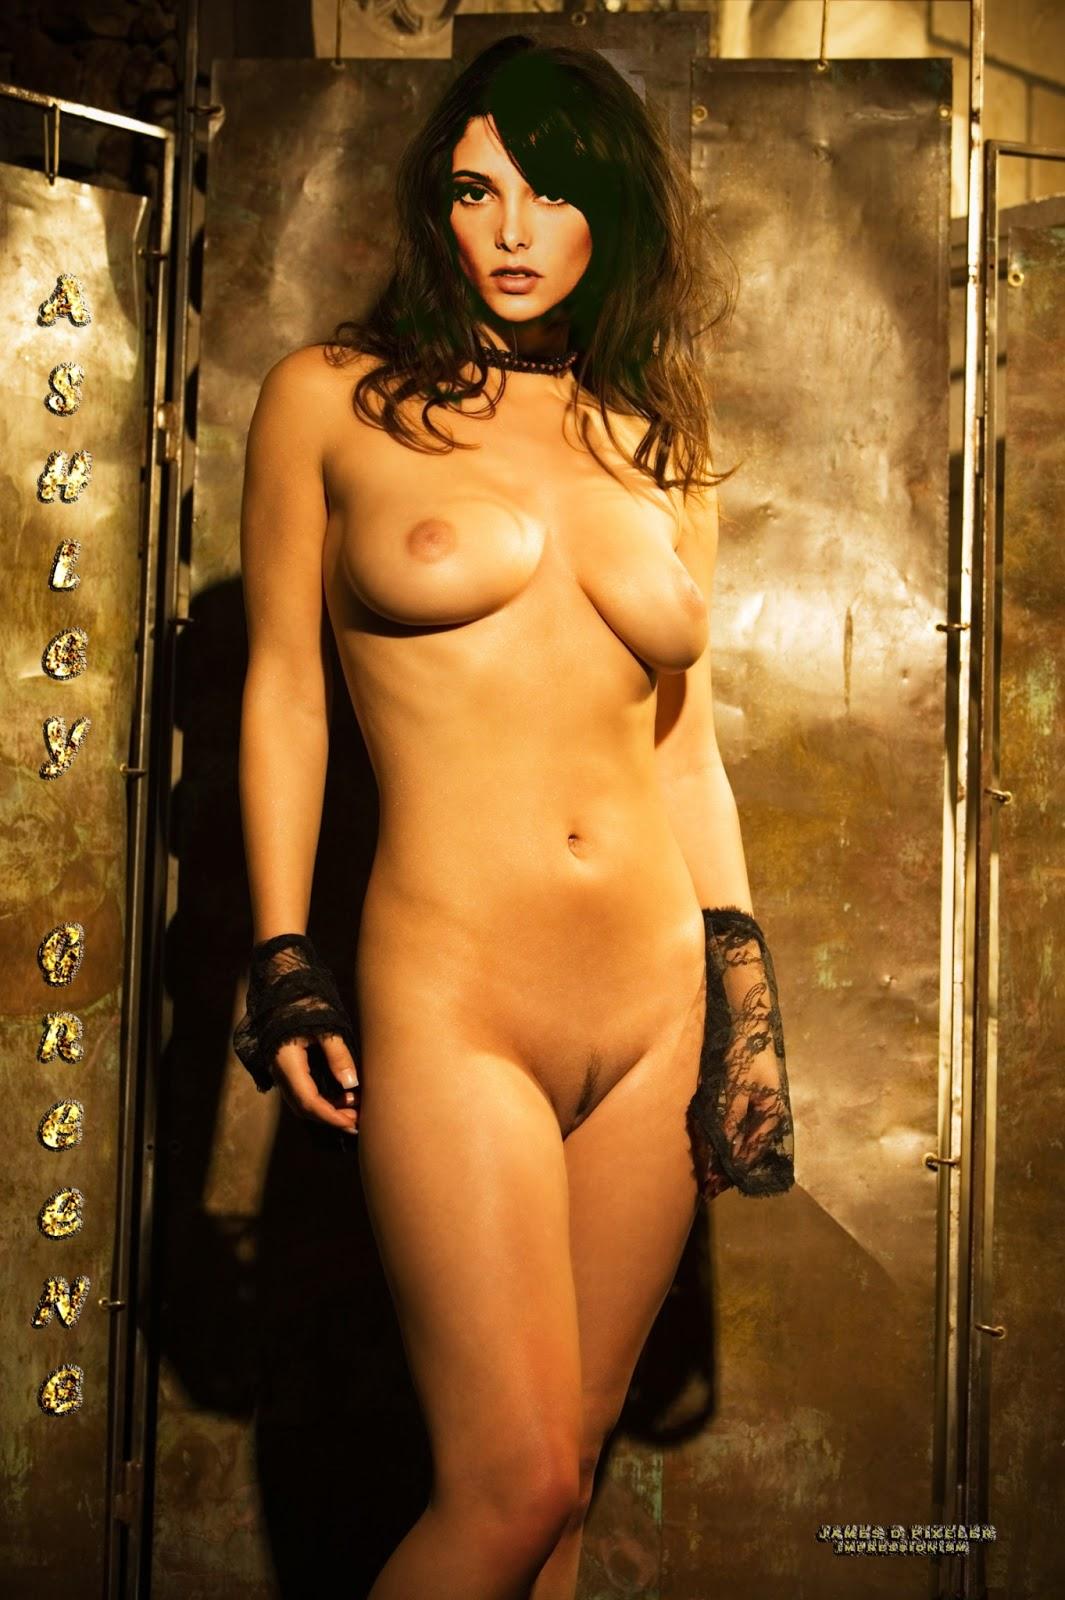 Communication on this topic: Ana braga see through photos 5, nude-pics-of-ashley-greene/